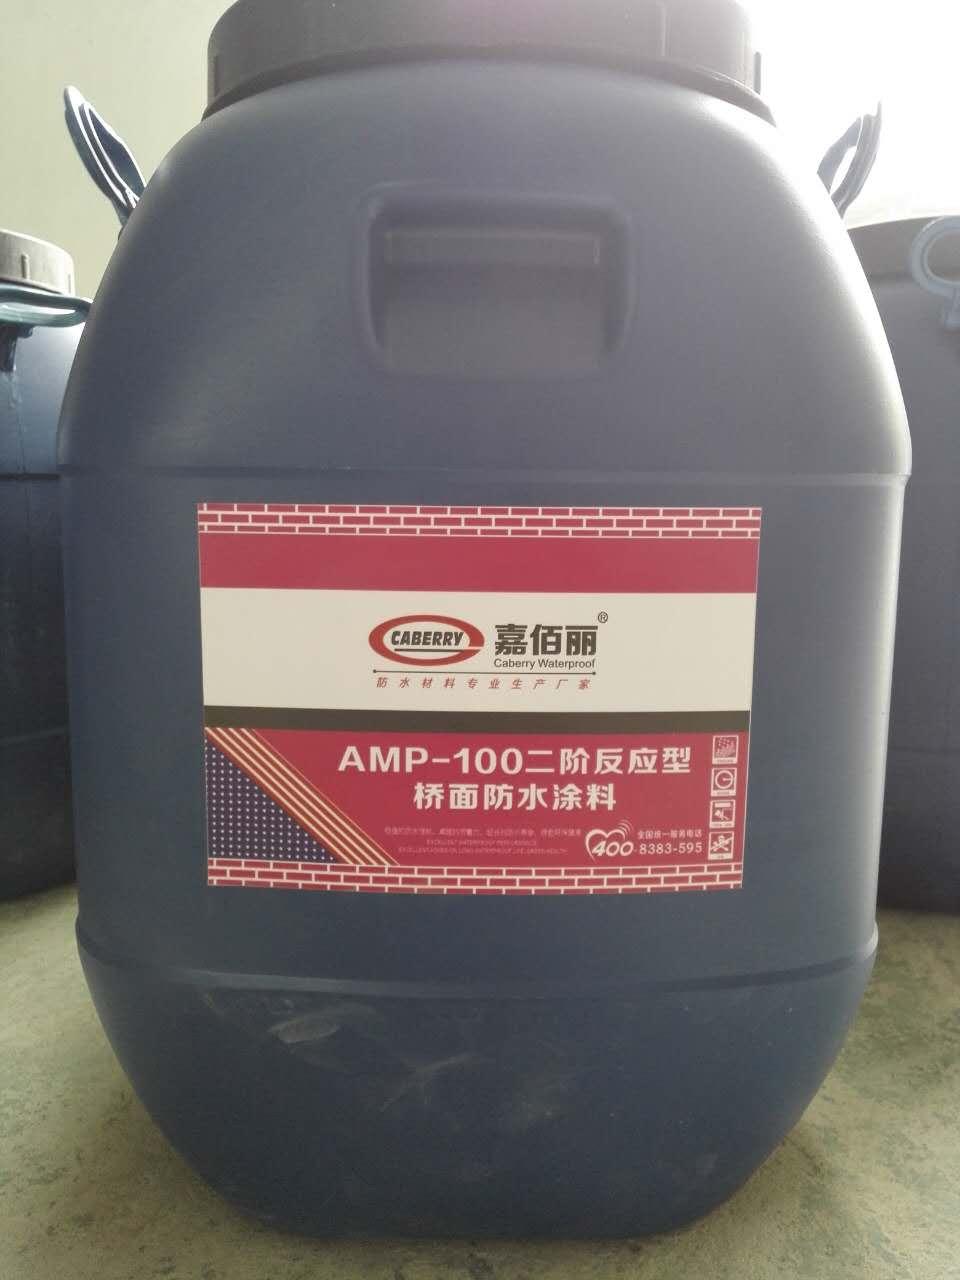 AMP-100二阶反应型桥面防水哪个厂家价格质量好AMP-1 产品图片